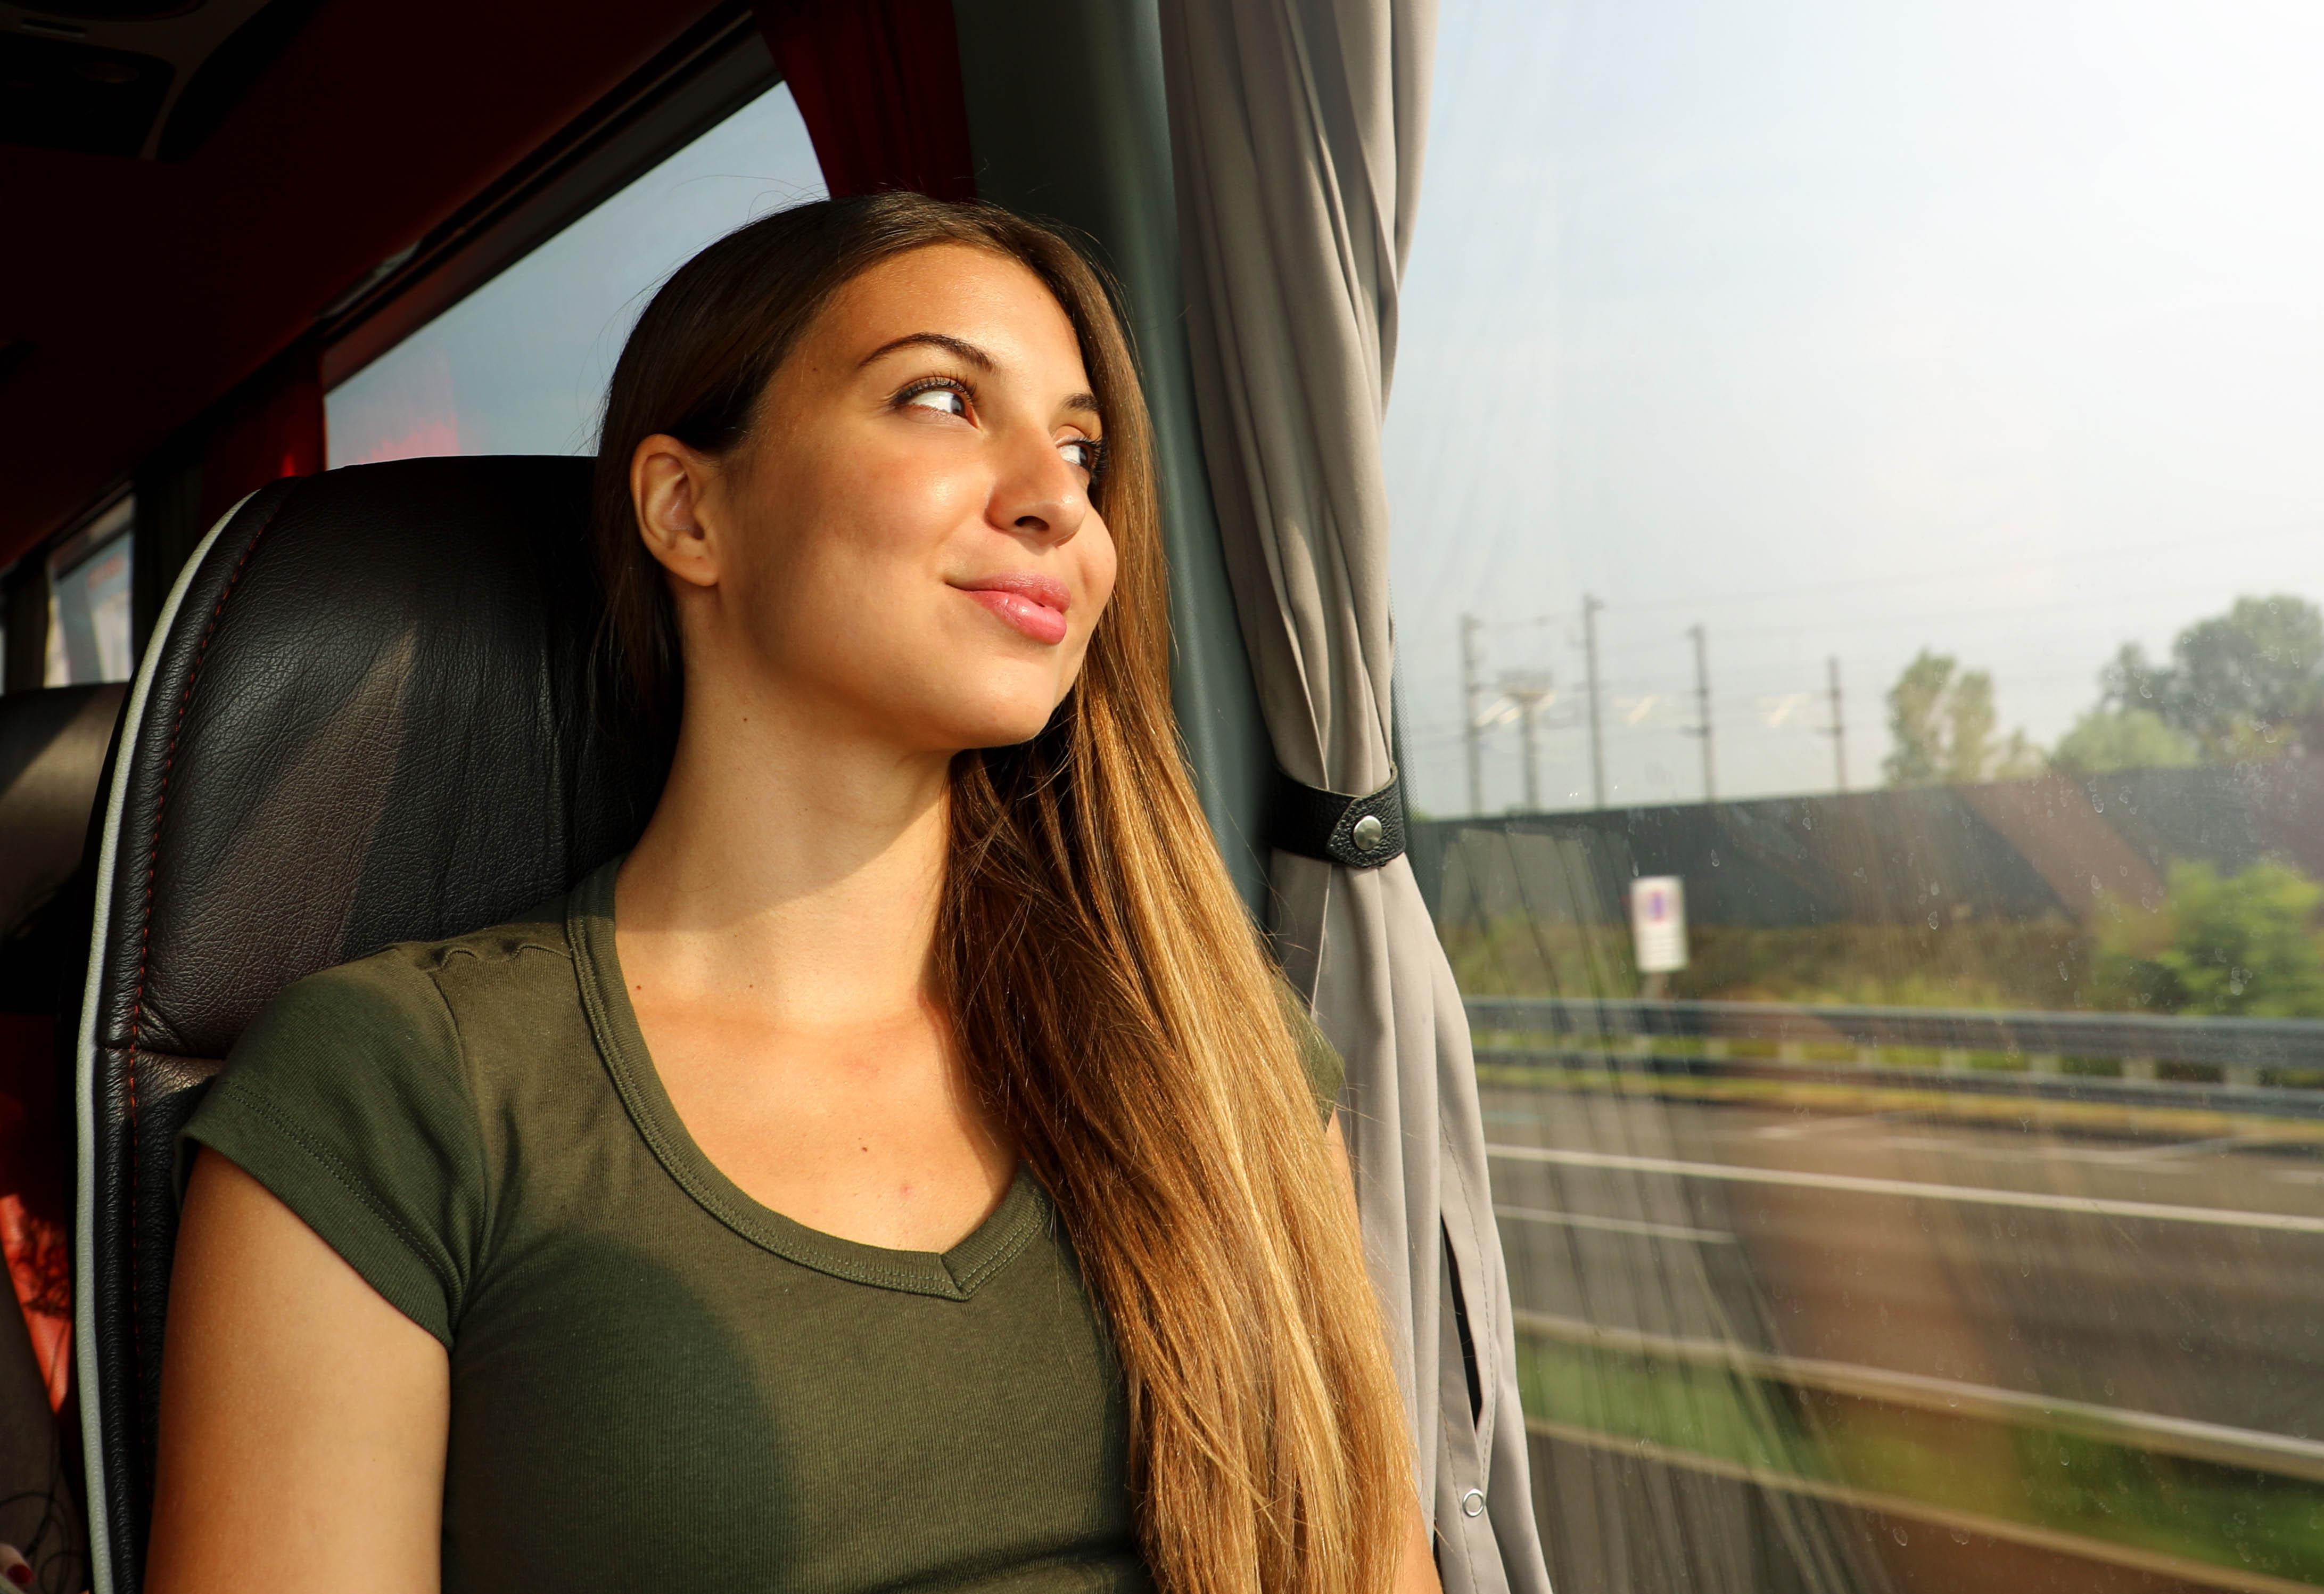 train-bus-traveler-beautiful-smiling-wom